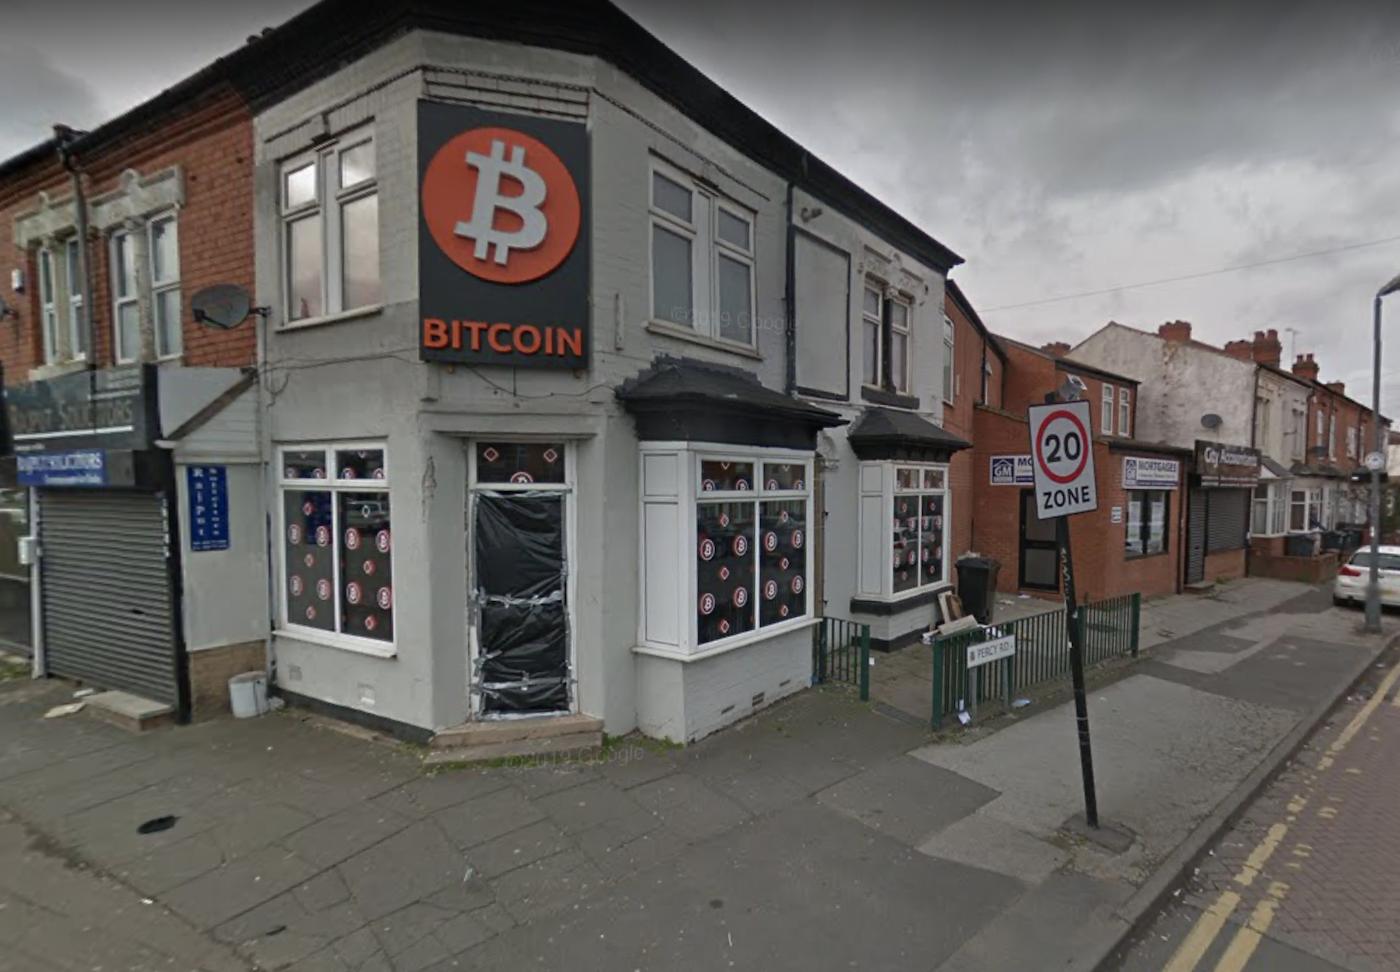 UK Thieves Burgle Bitcoin Center, Find Zilch